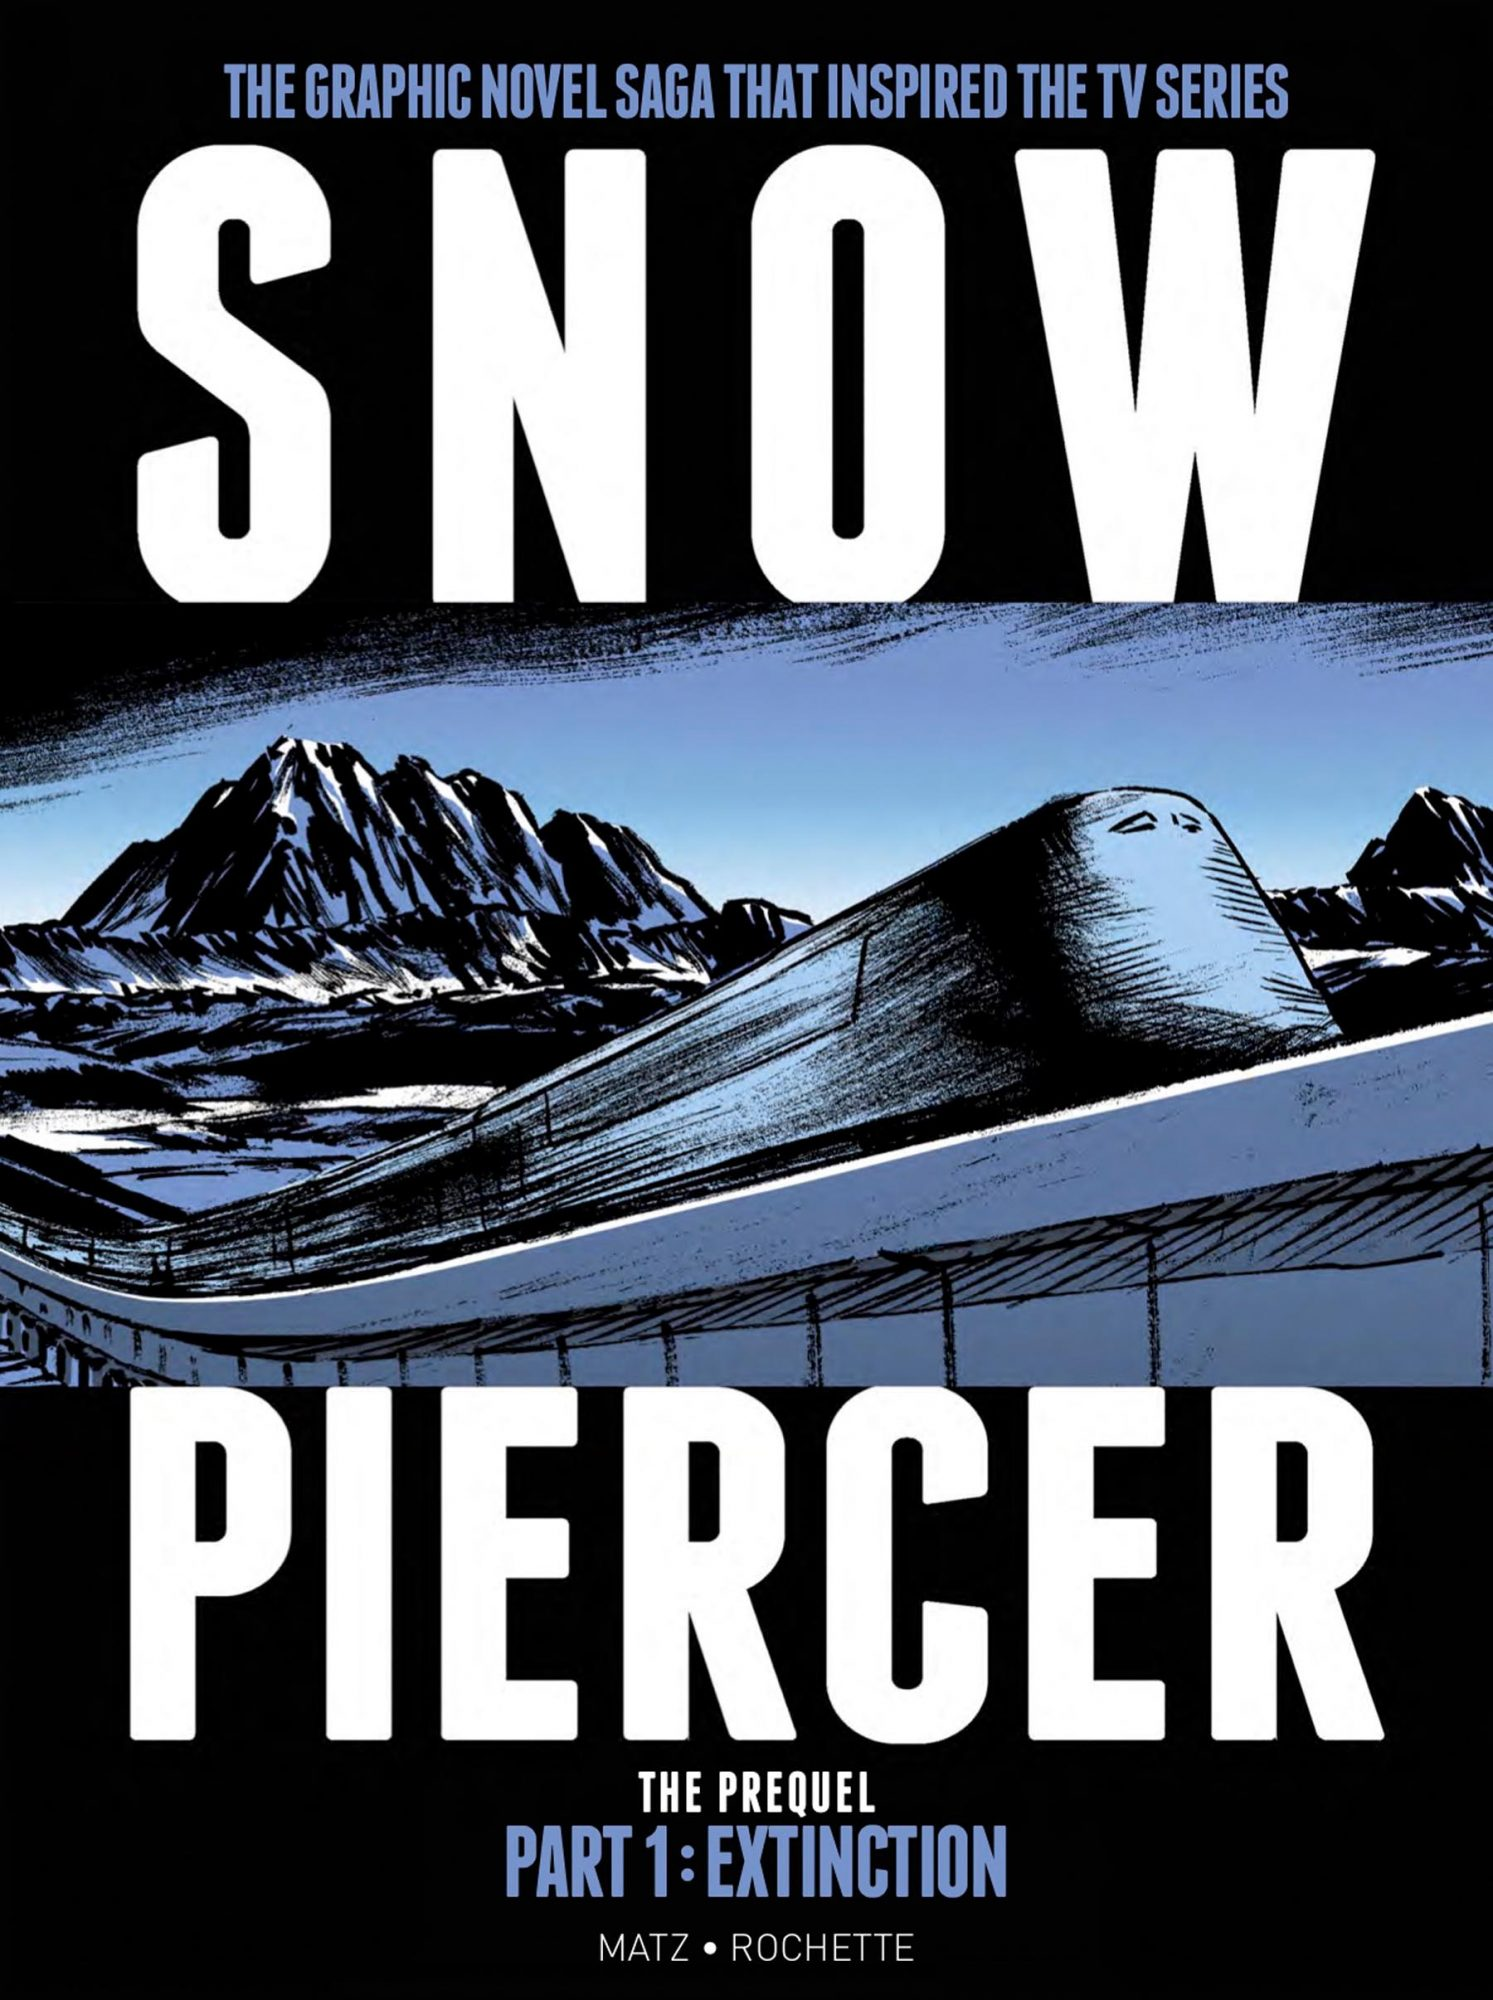 Snowpiercer The Prequel Part 1: Extinction